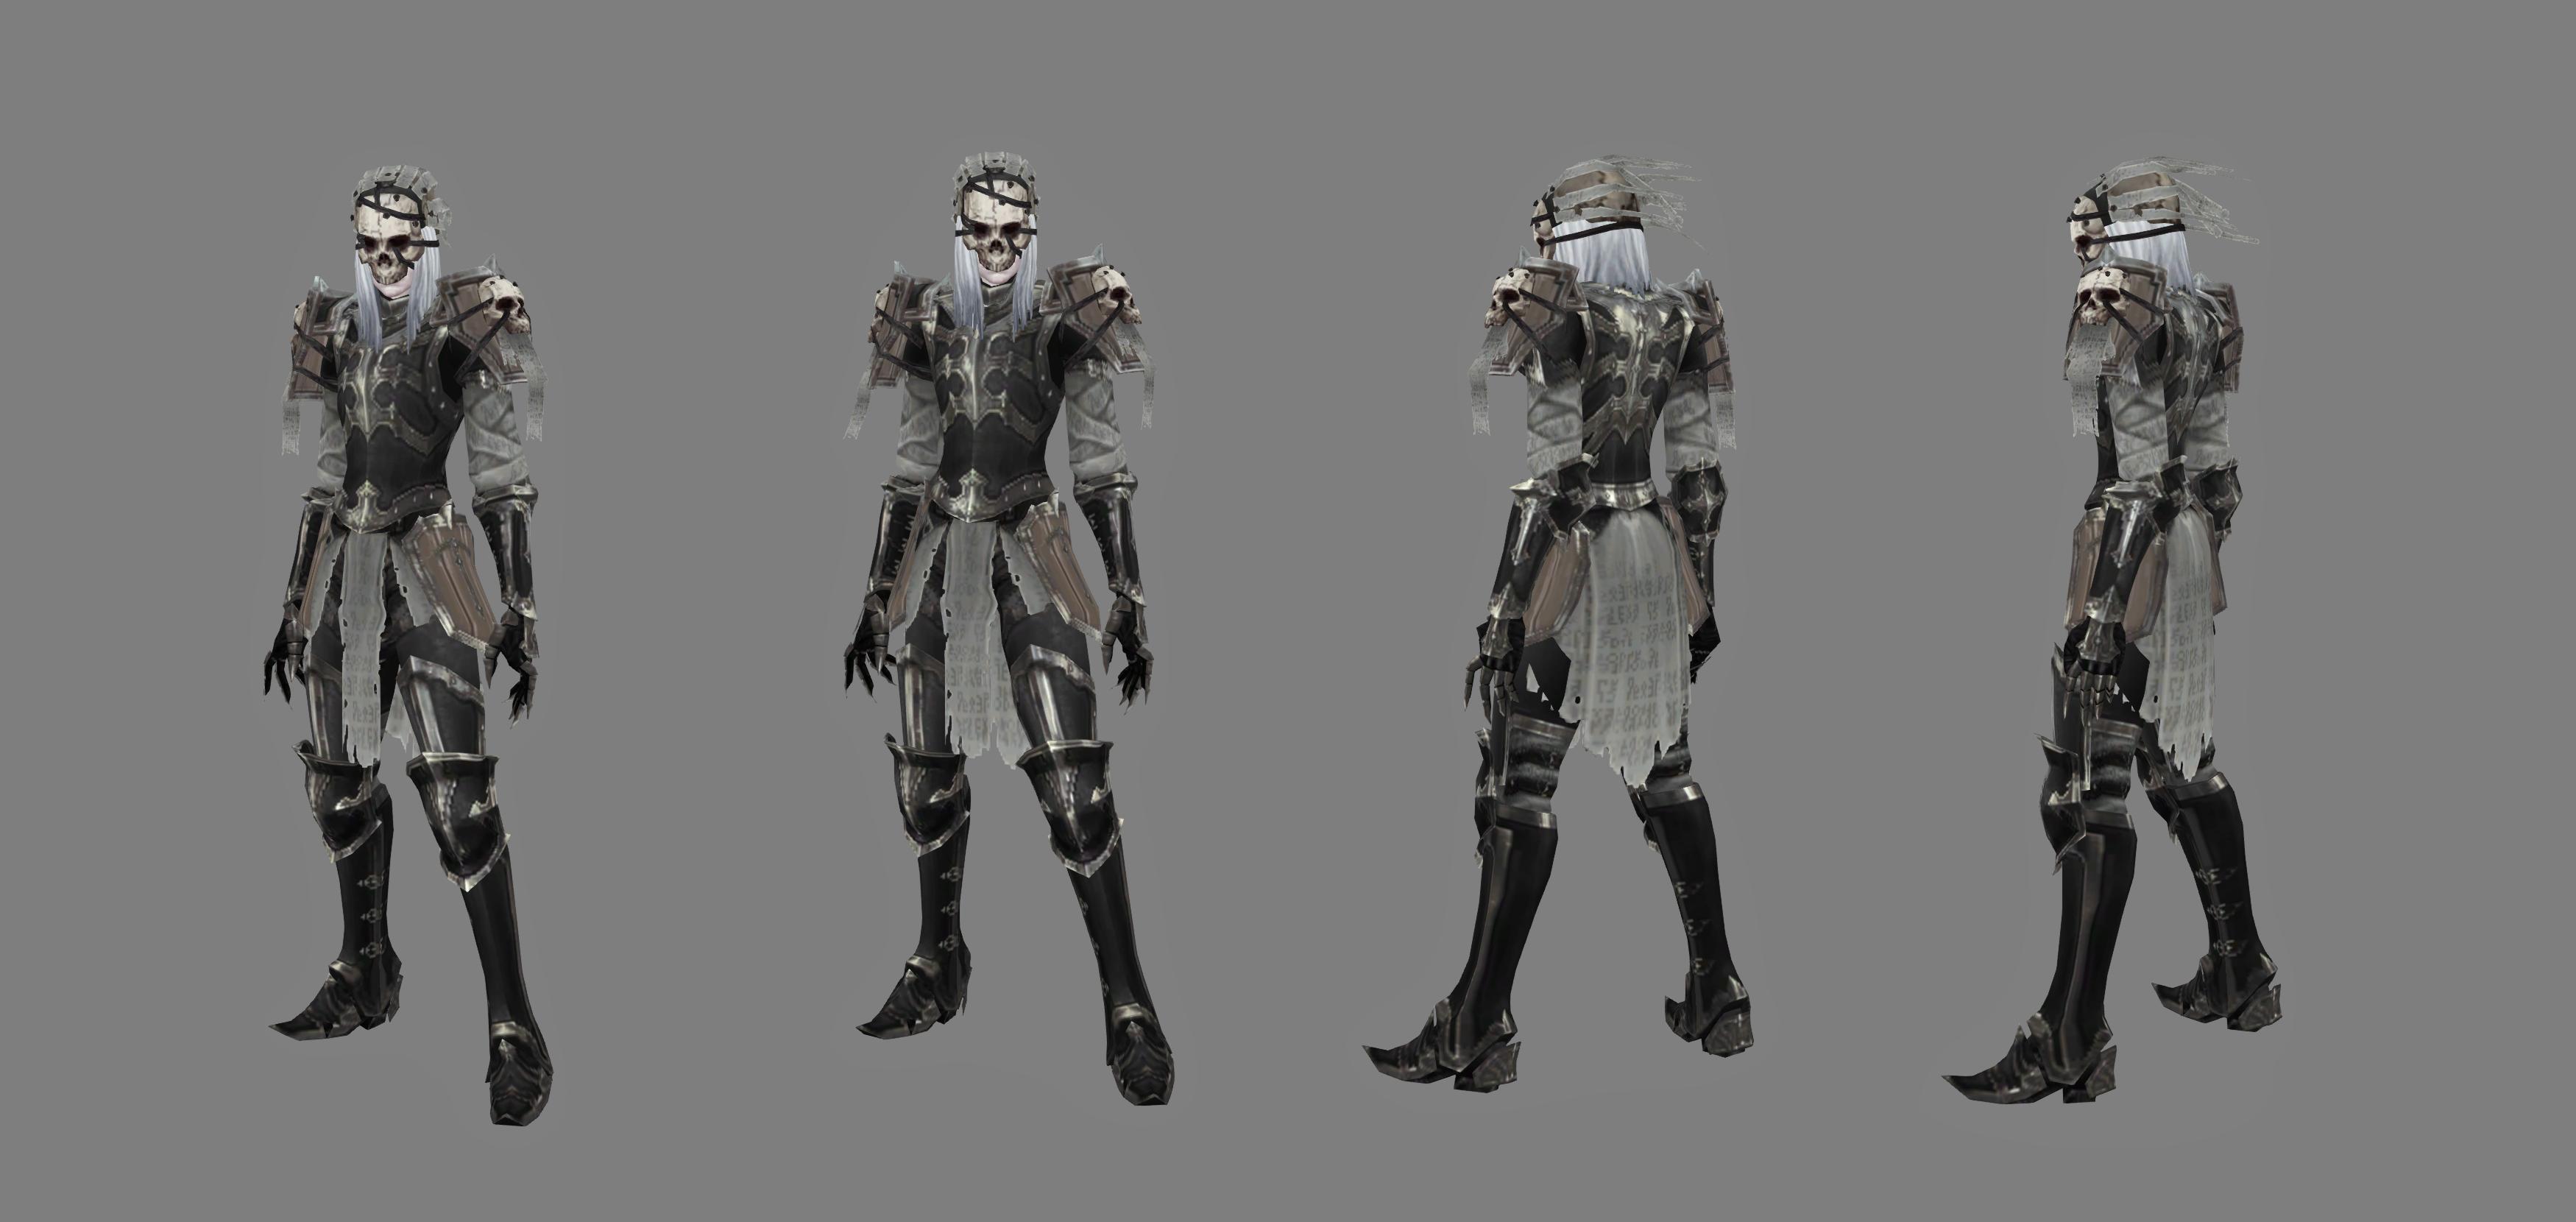 Co dokáže Necromancer v Diablu 3? Podívejte se 140198